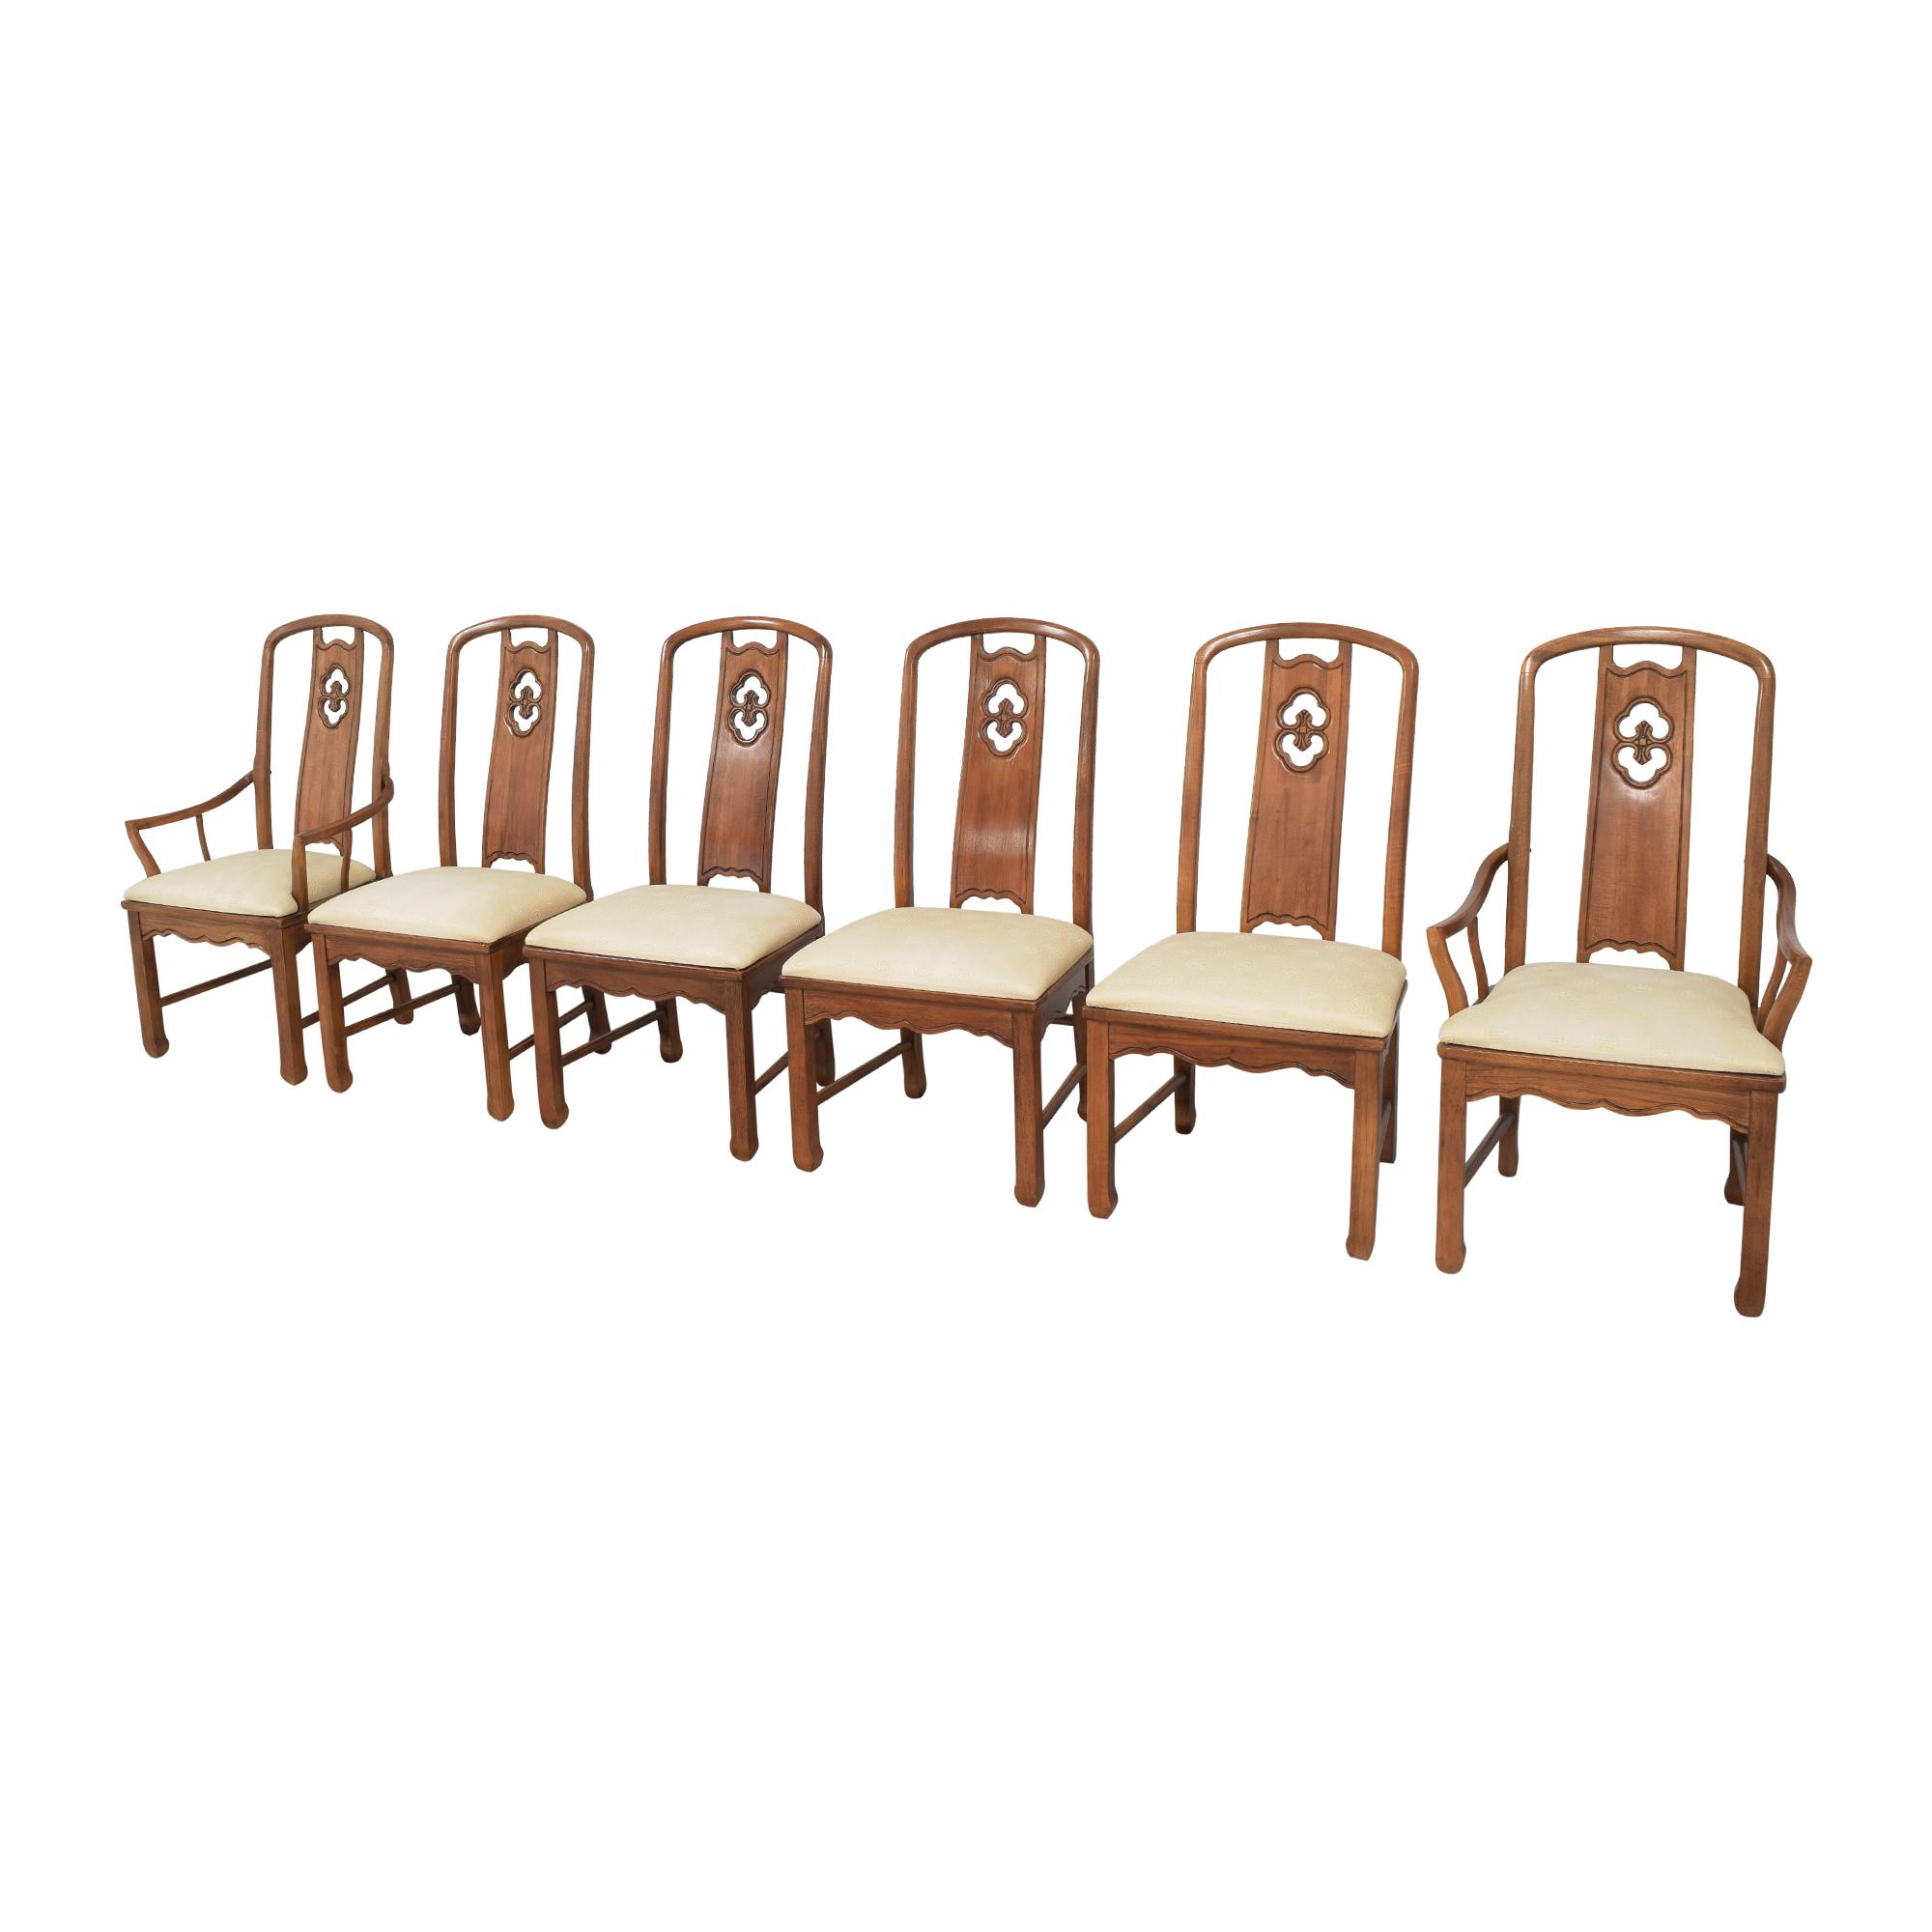 Thomasville Thomasville Dining Chairs ma